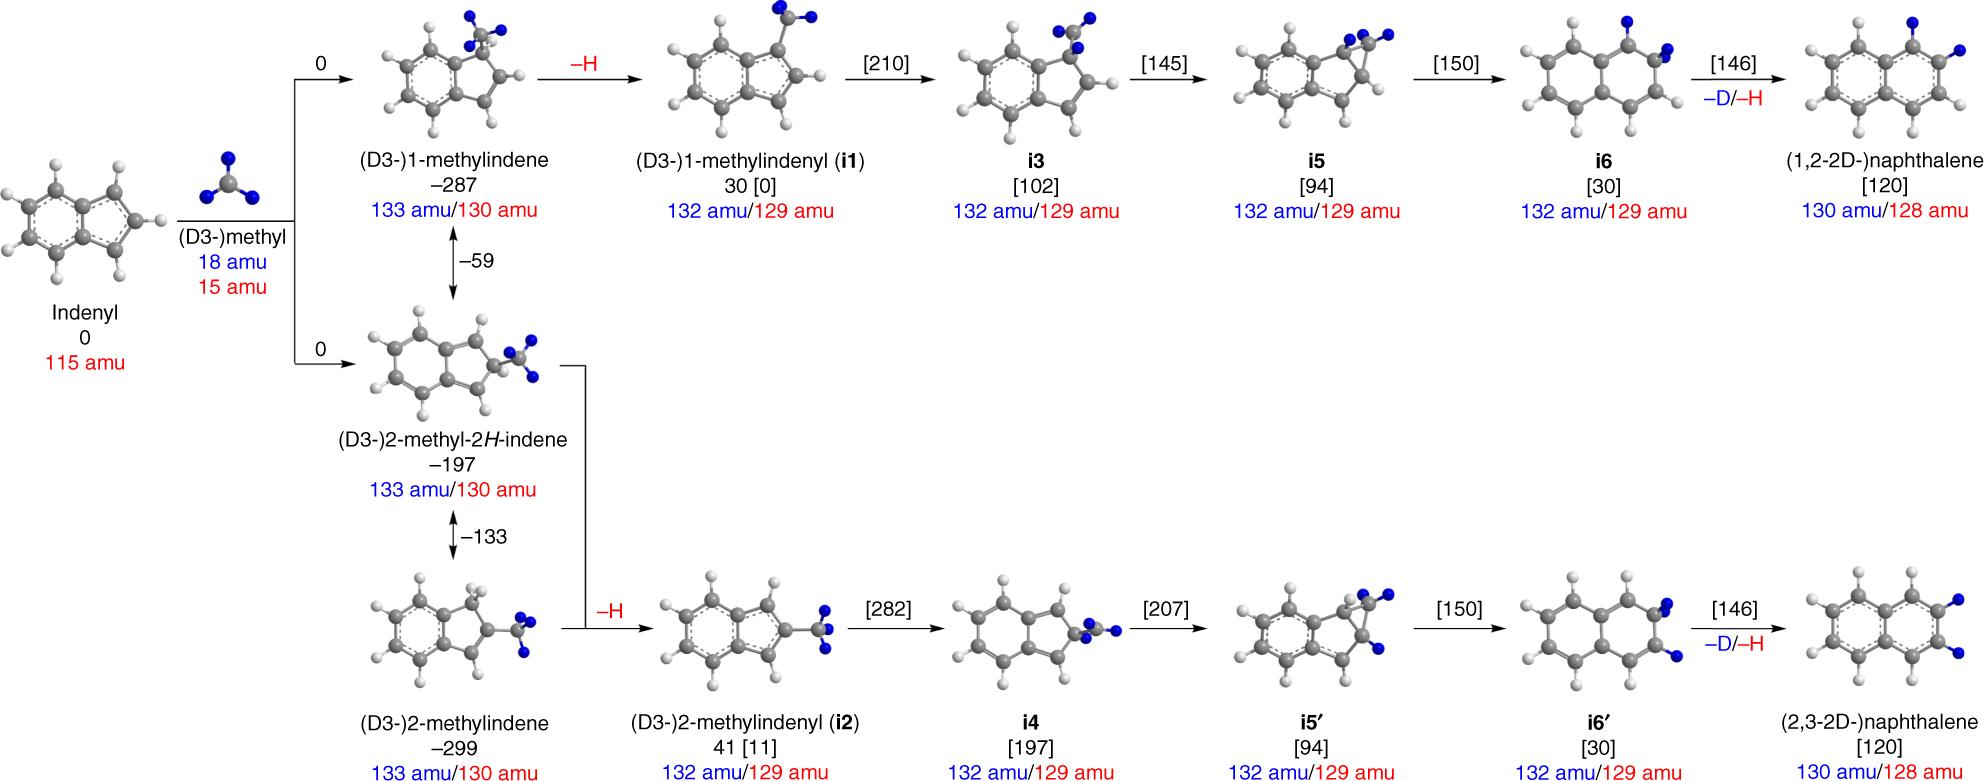 Molecular mass growth through ring expansion in polycyclic